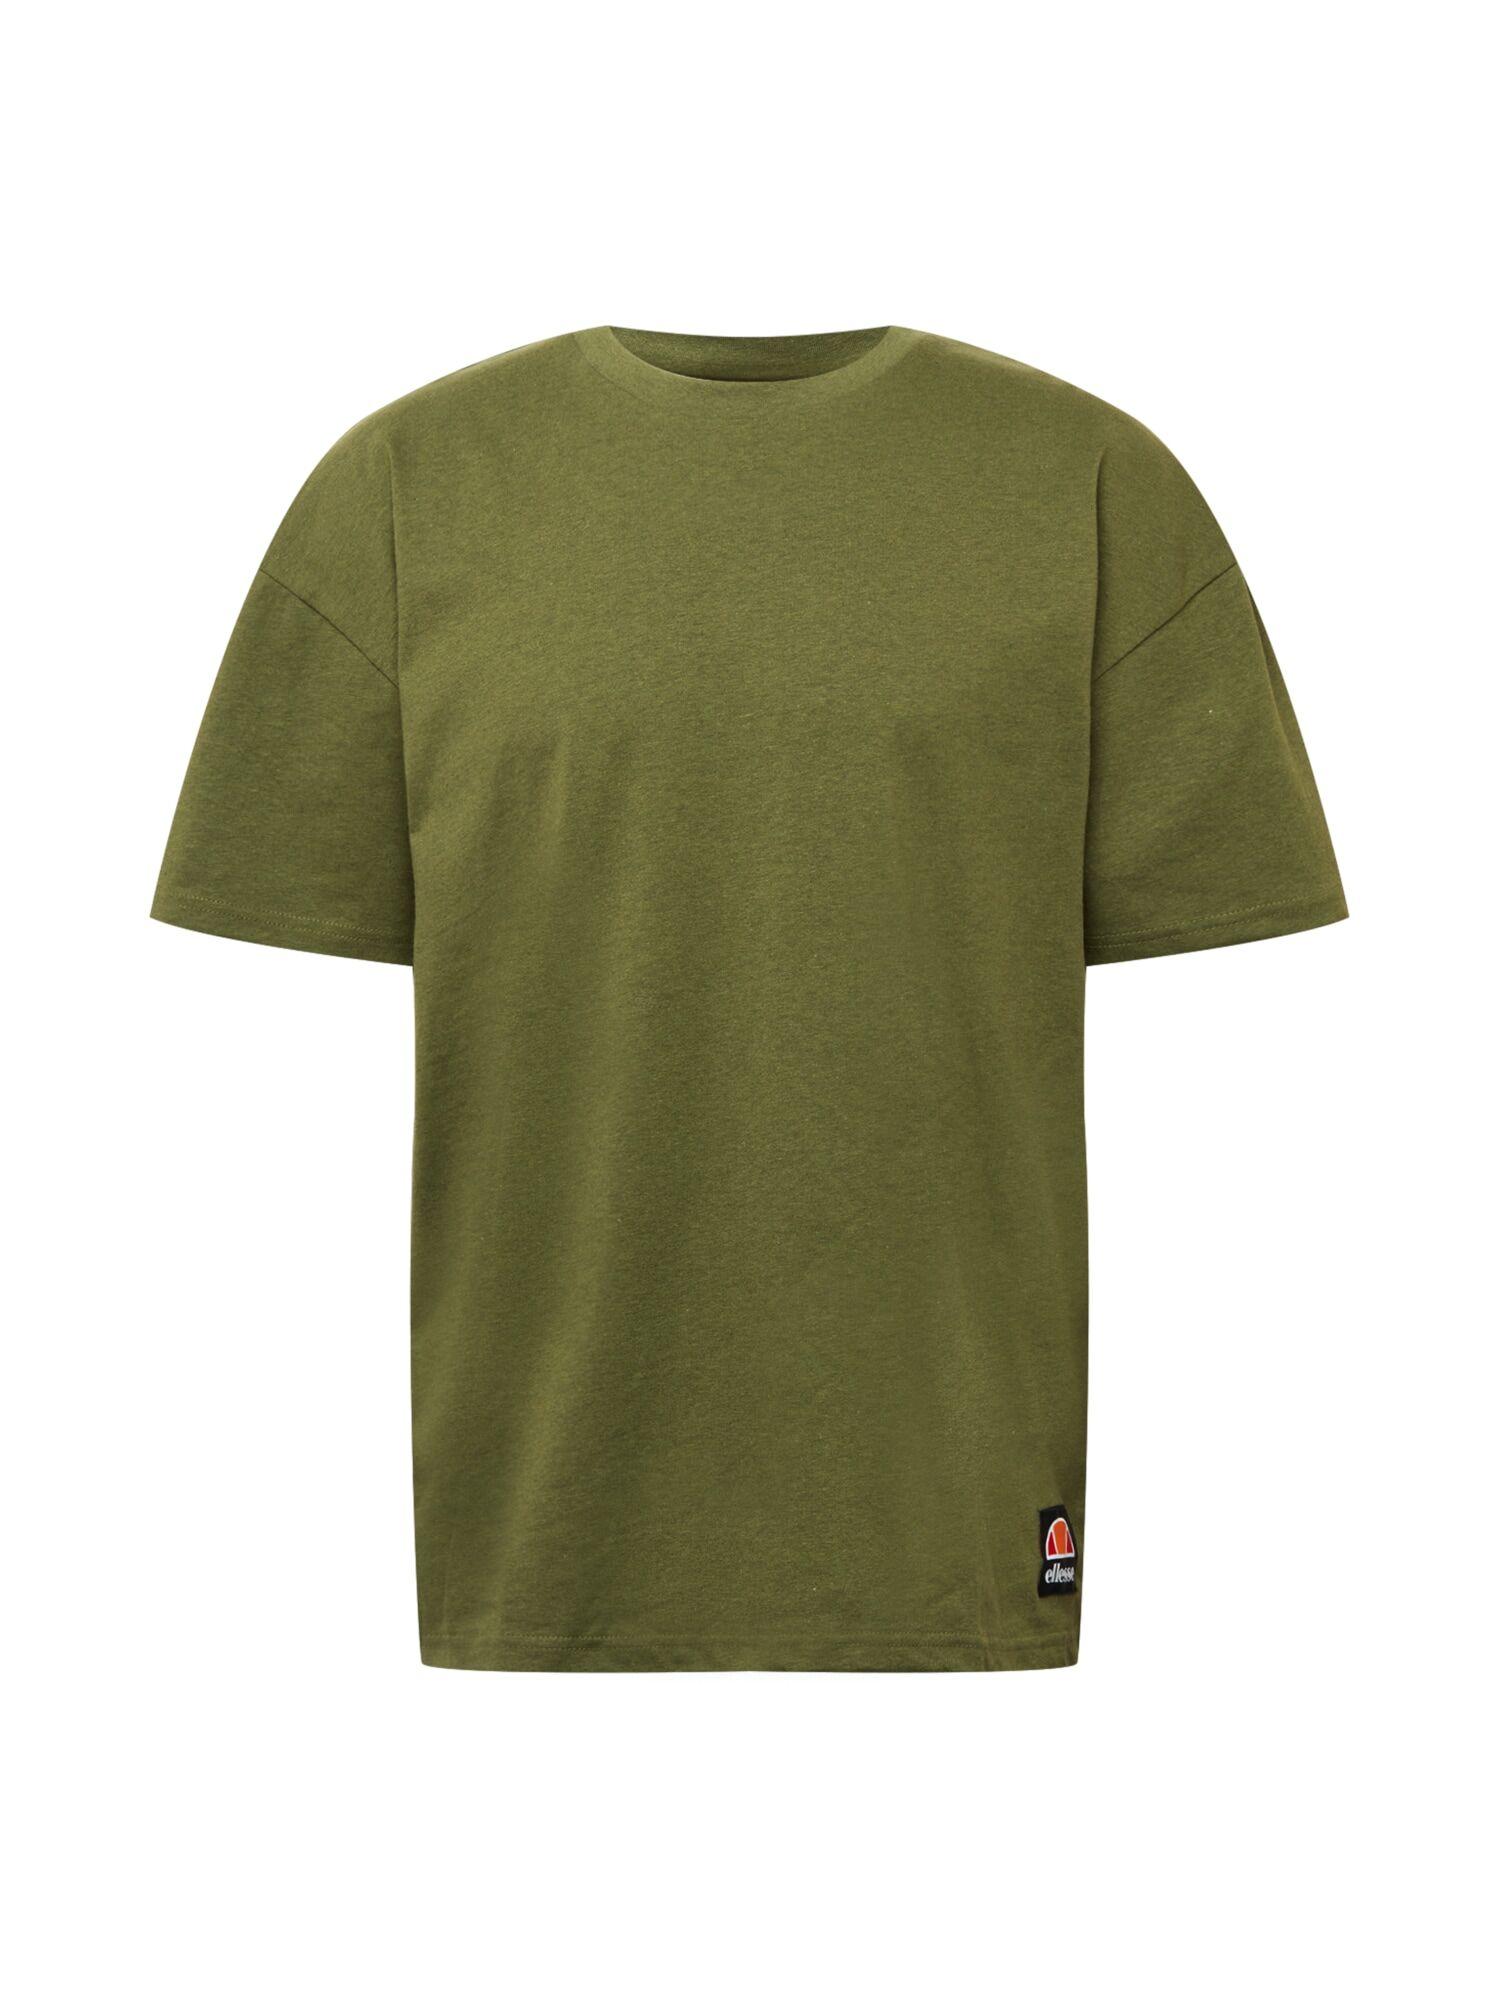 ELLESSE T-Shirt 'Avis'  - Vert - Taille: L - male